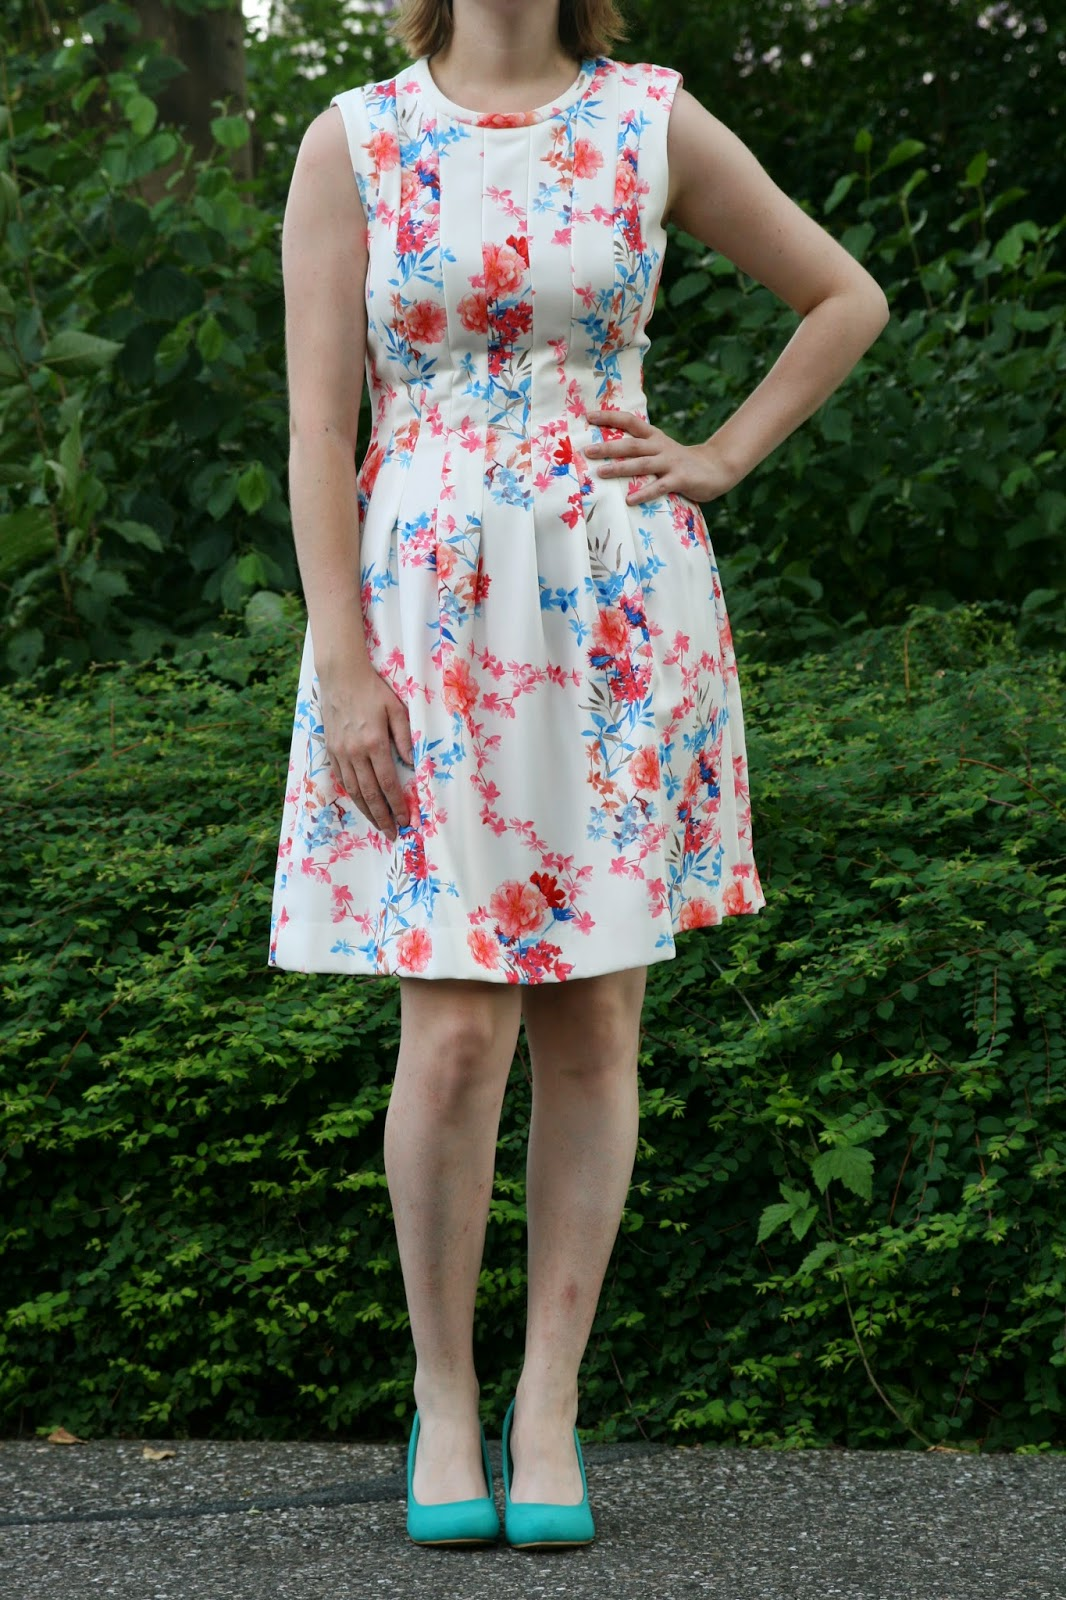 http://hmlovur.blogspot.nl/2014/07/outfits-of-week-week-30.html